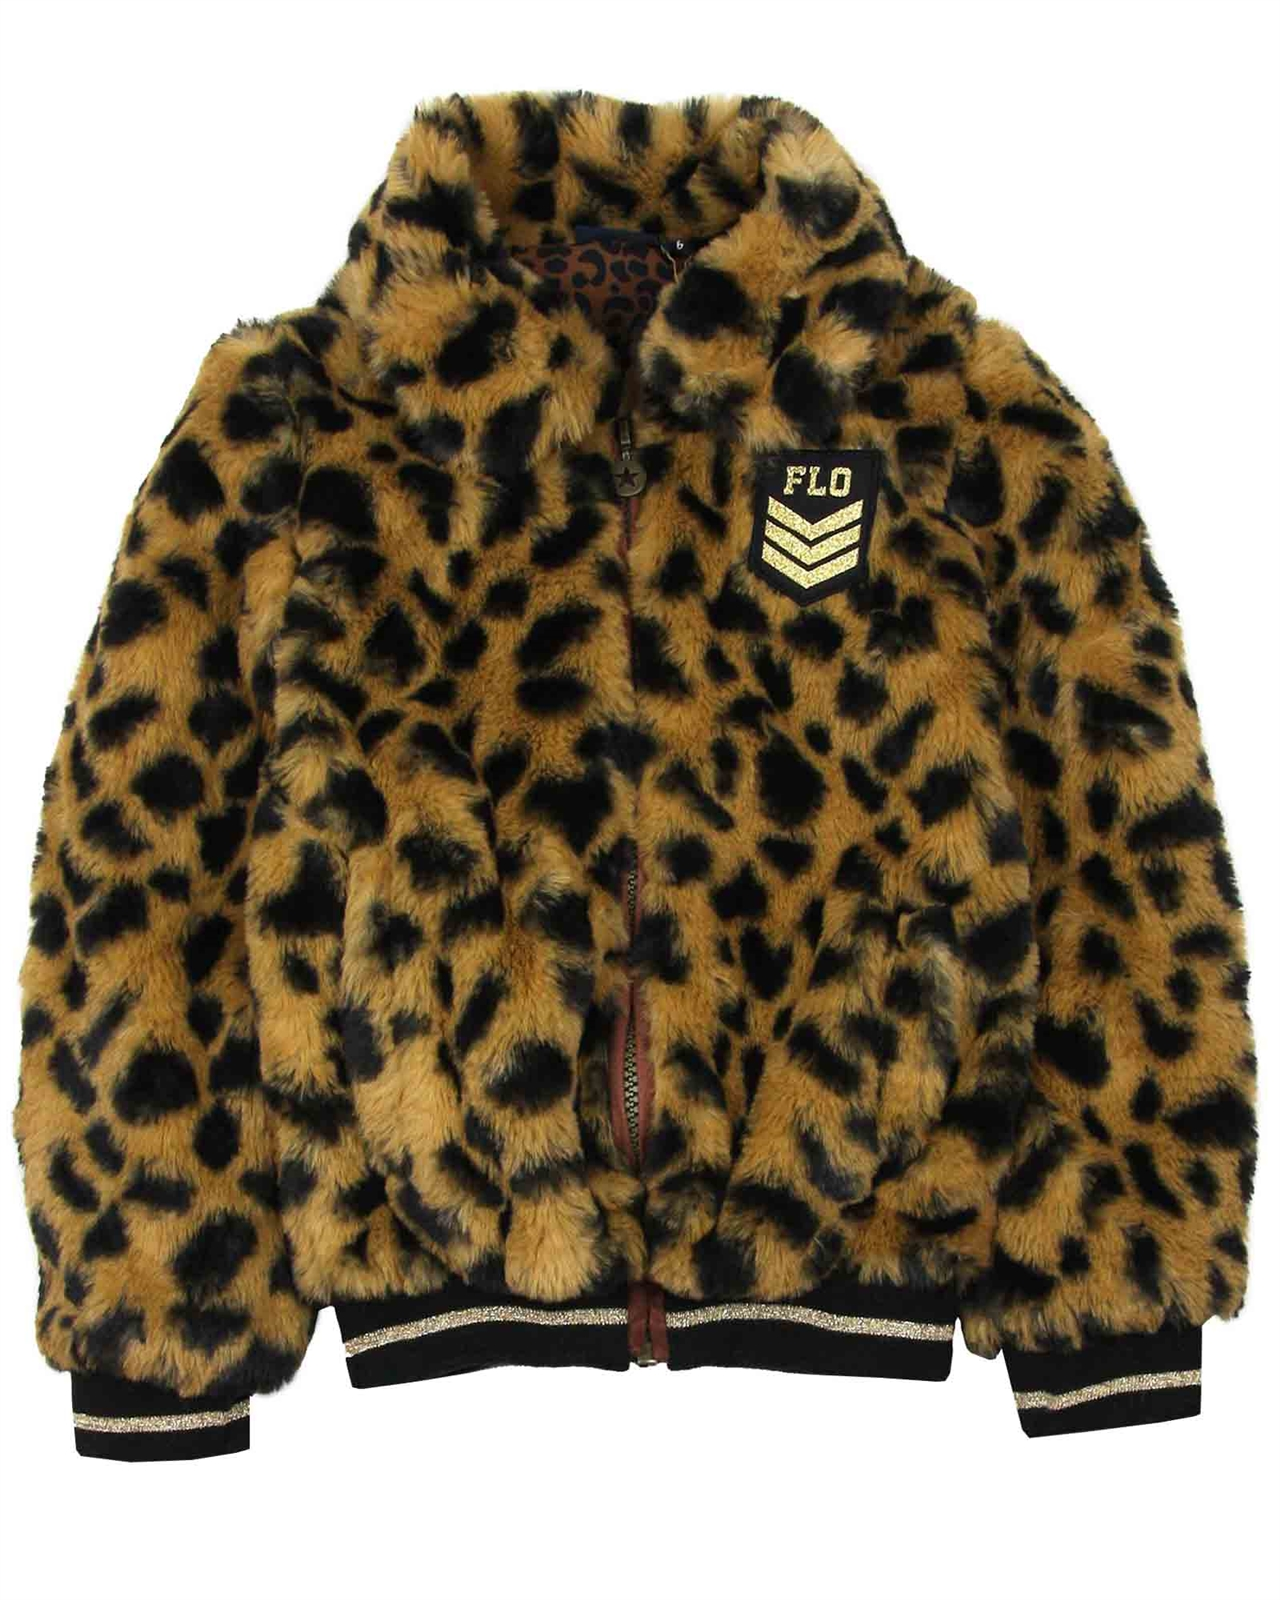 36b5347bc0cf Dress Like Flo Fake Fur Bomber Jacket - Dress Like Flo - Dress Like ...